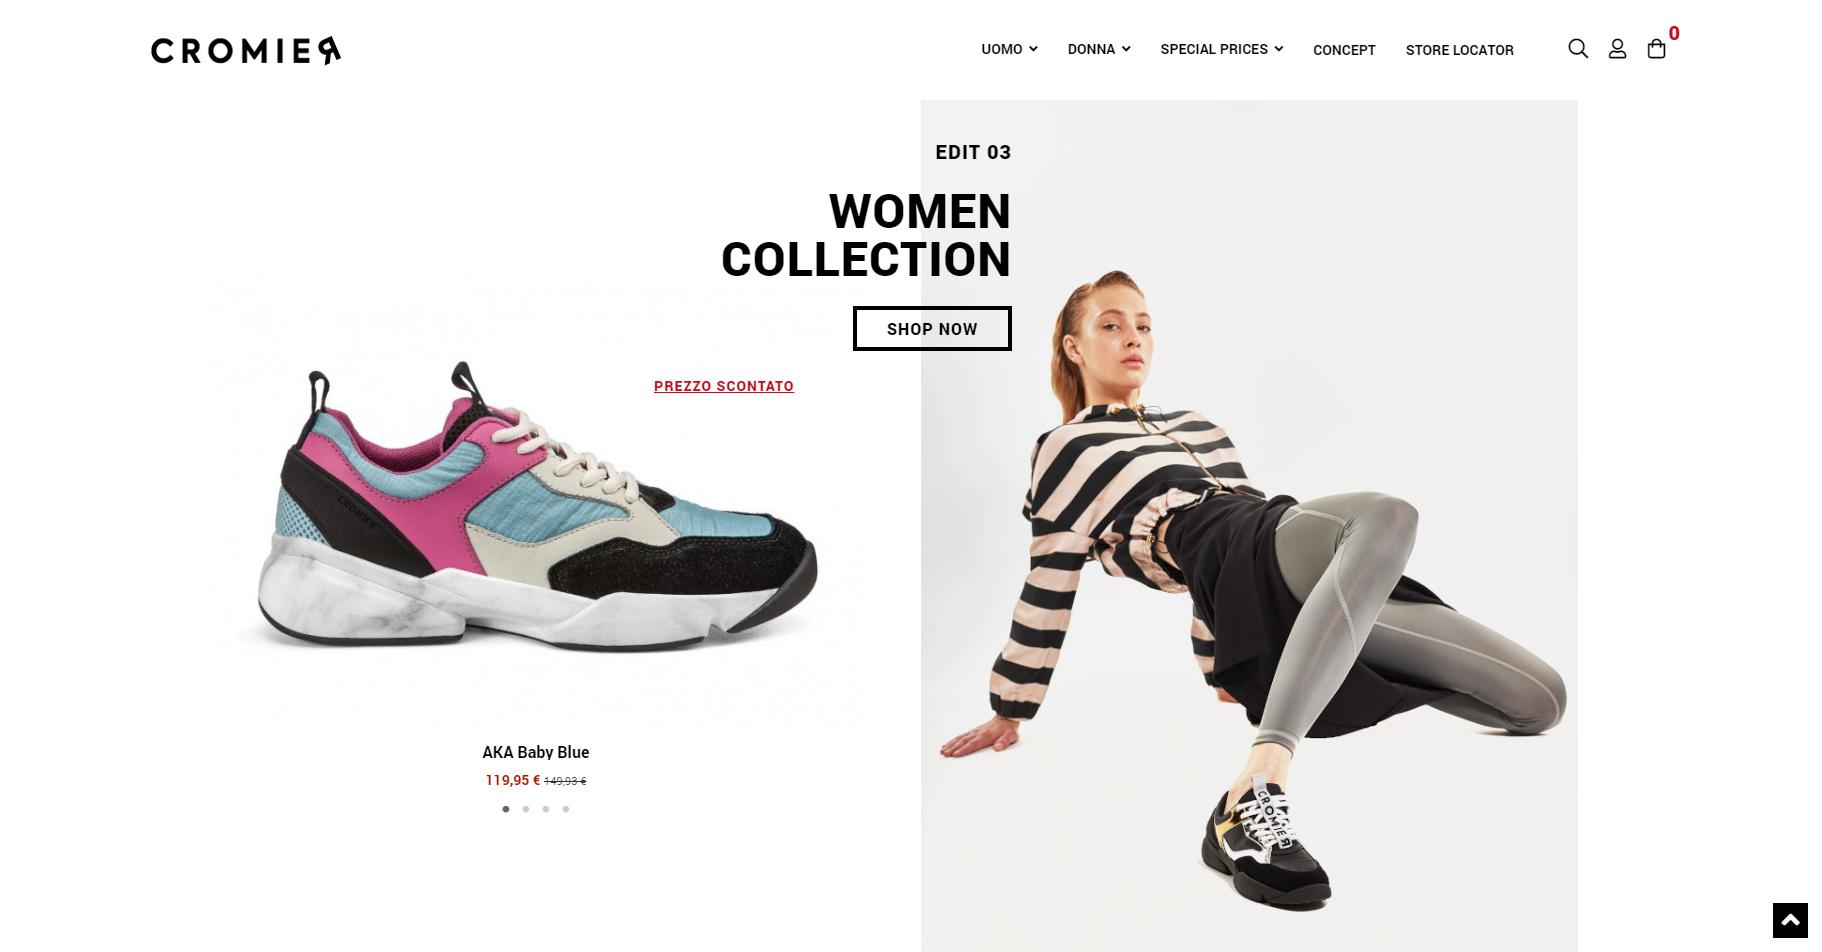 Cromier Italian Sneakers - Website of the Day